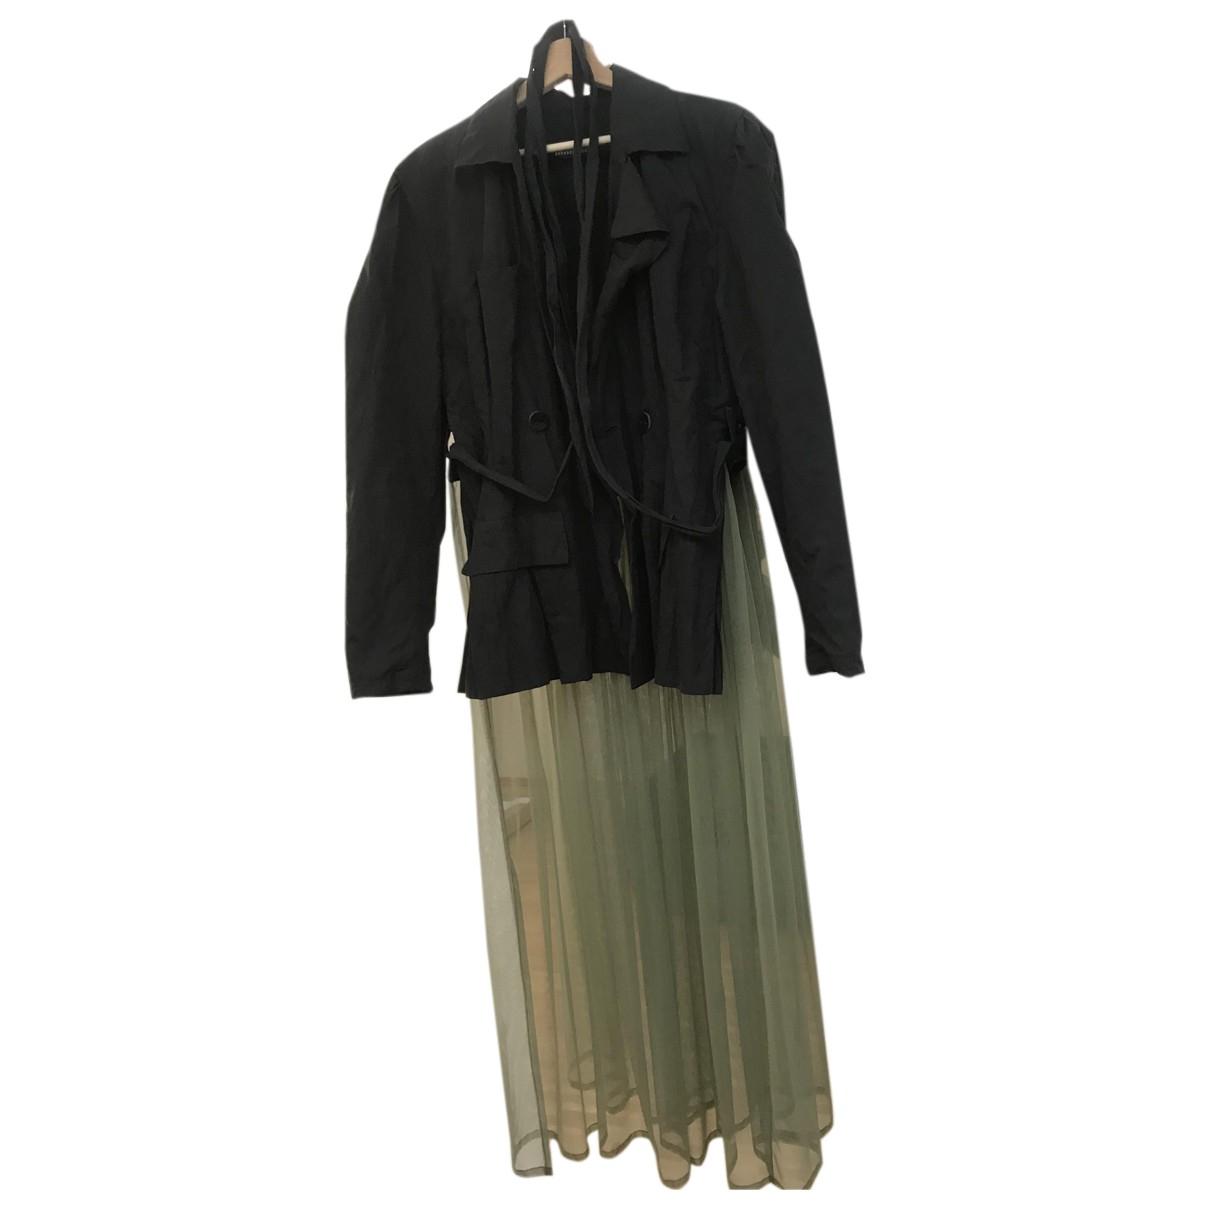 Barbara Bologna - Veste   pour femme en coton - noir